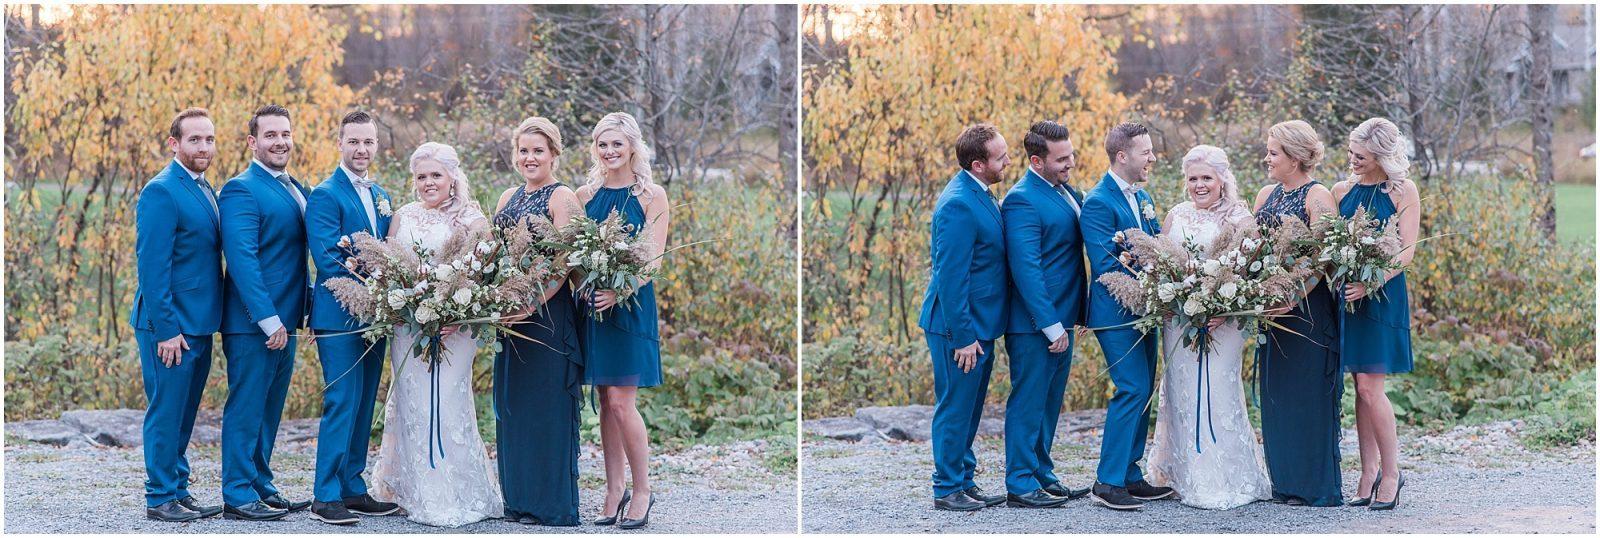 0062 Bethany and Luc - Fall Backyard Ottawa Wedding - Copper and Navy - PhotosbyEmmaH.jpg